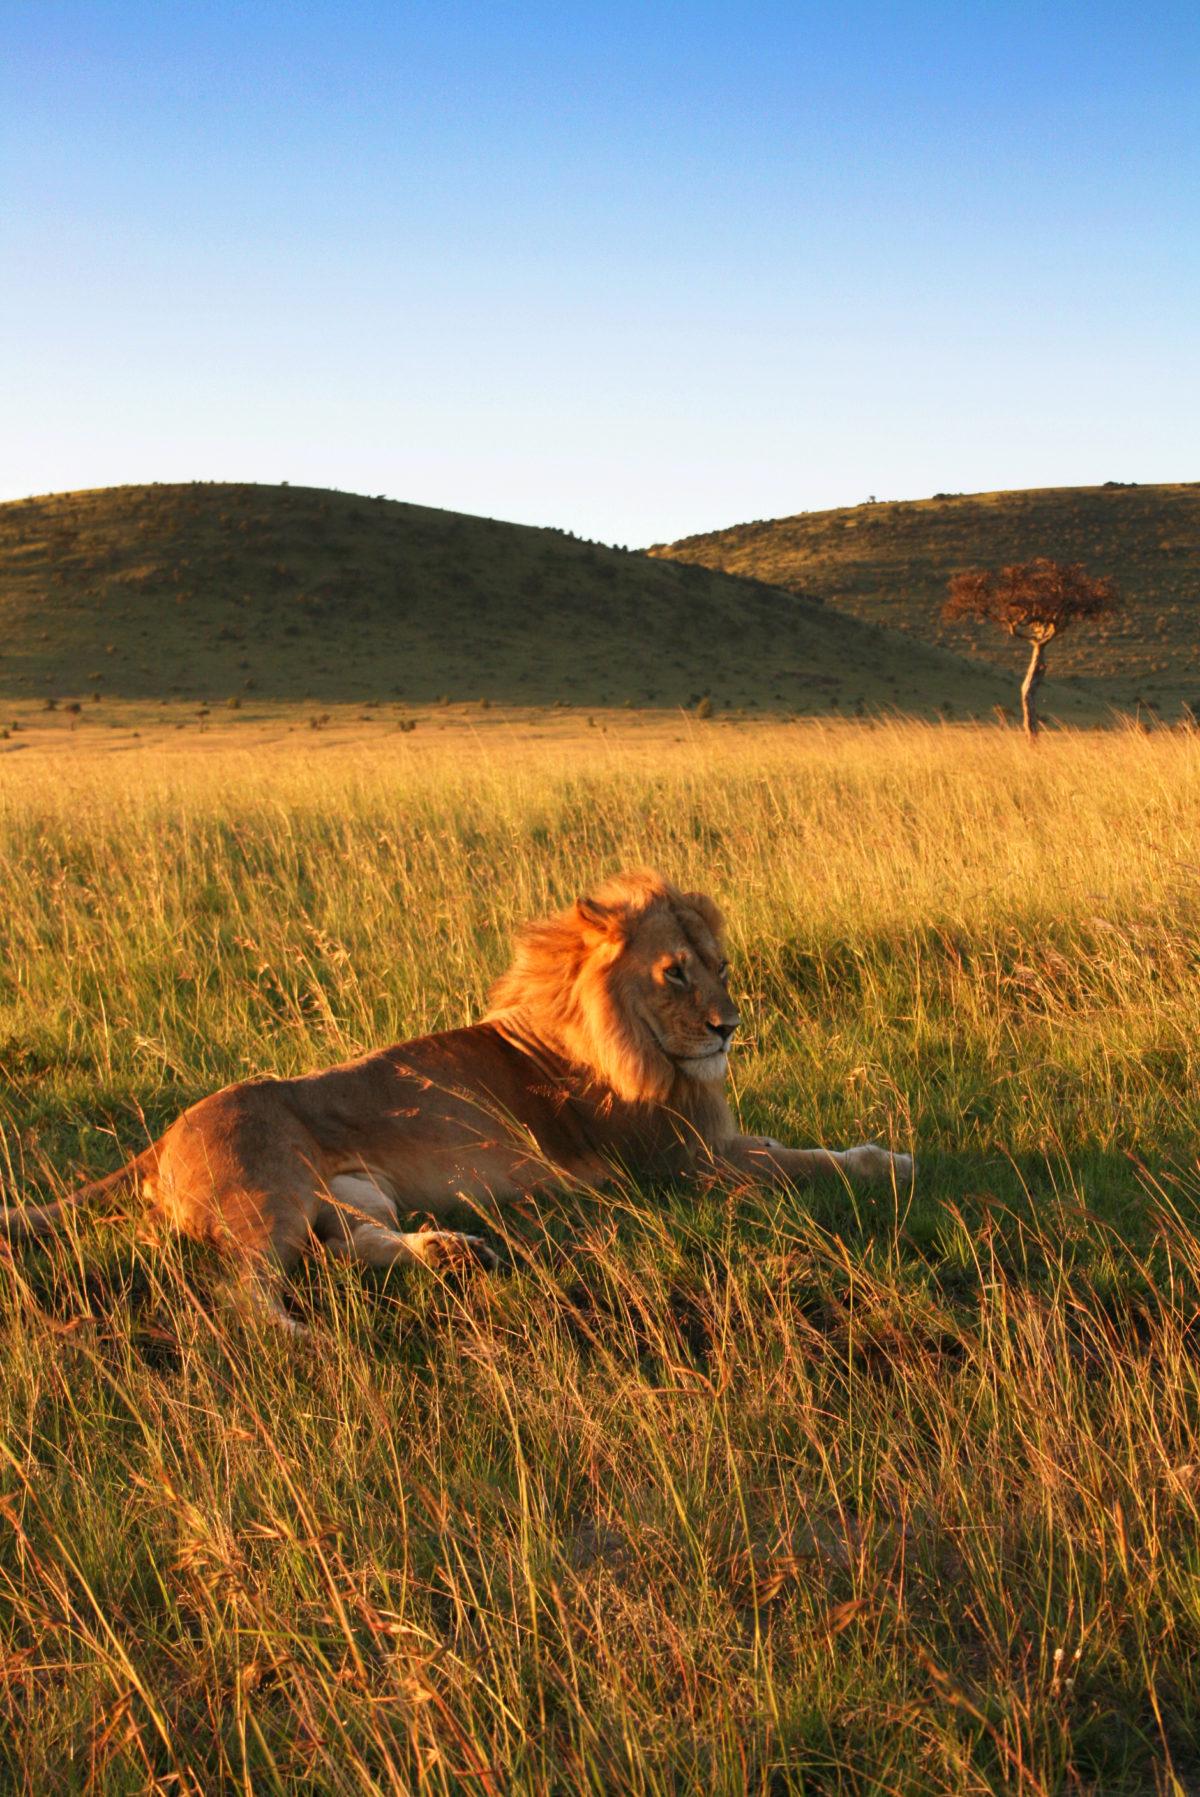 Lions met on a safari tour of the Masai Mara National Reserve